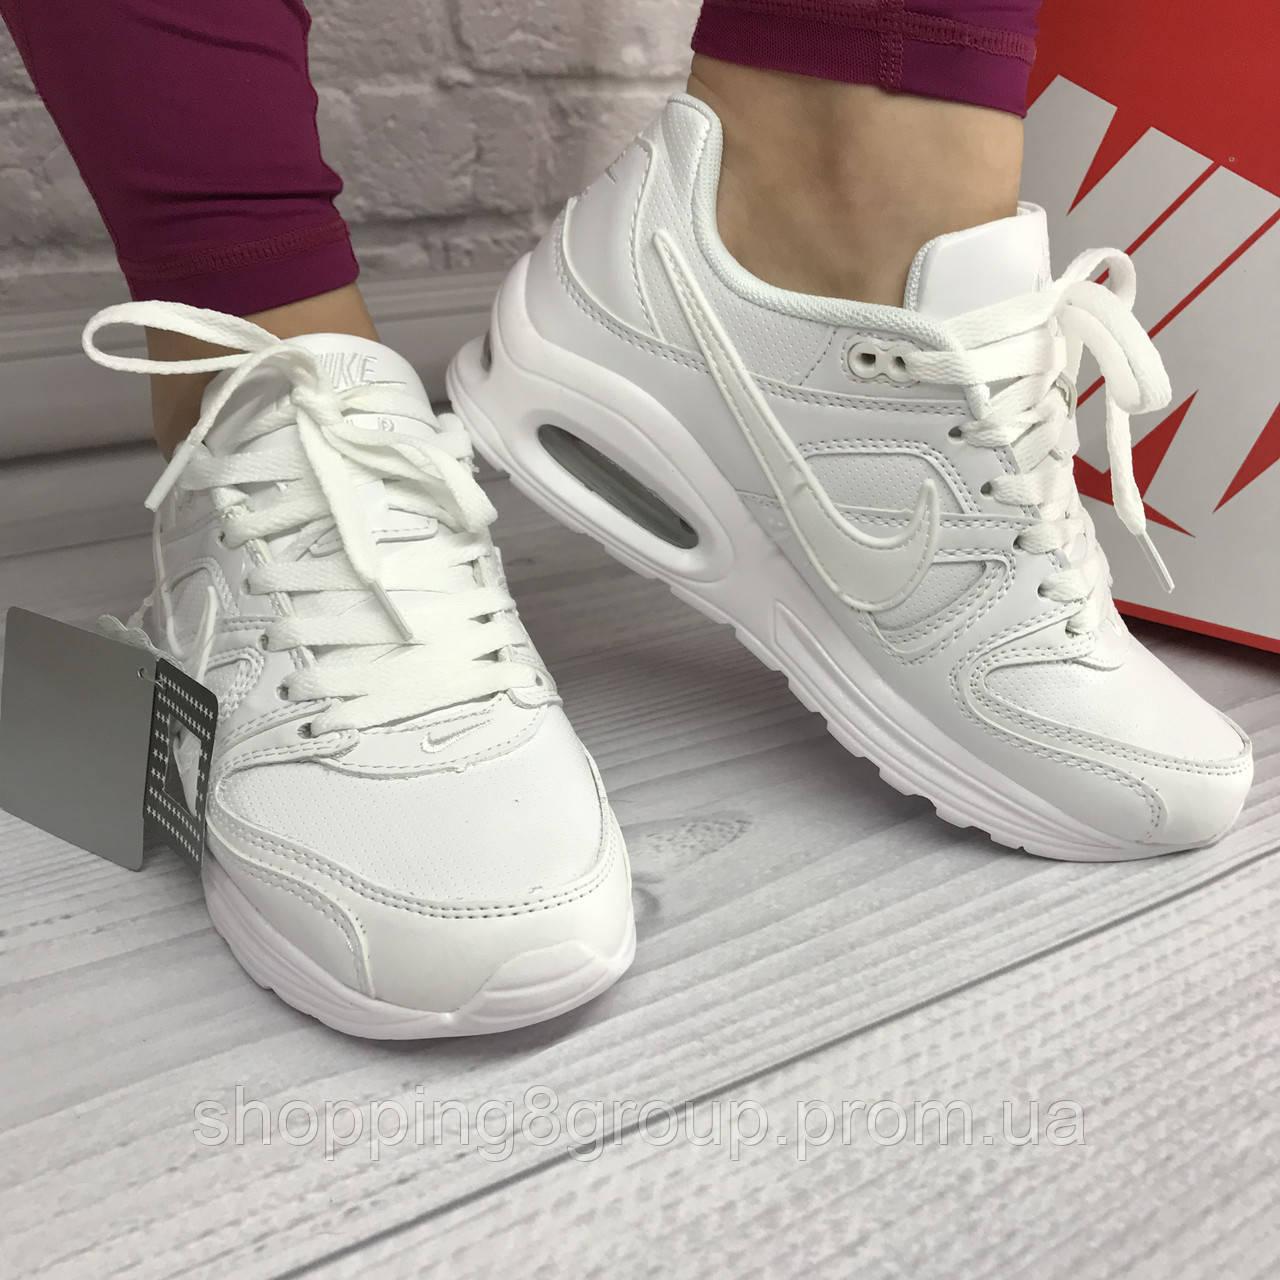 b98a87b9 Кроссовки женские Nike Air Max (белые) 39, 40 - Shopping group в Днепре